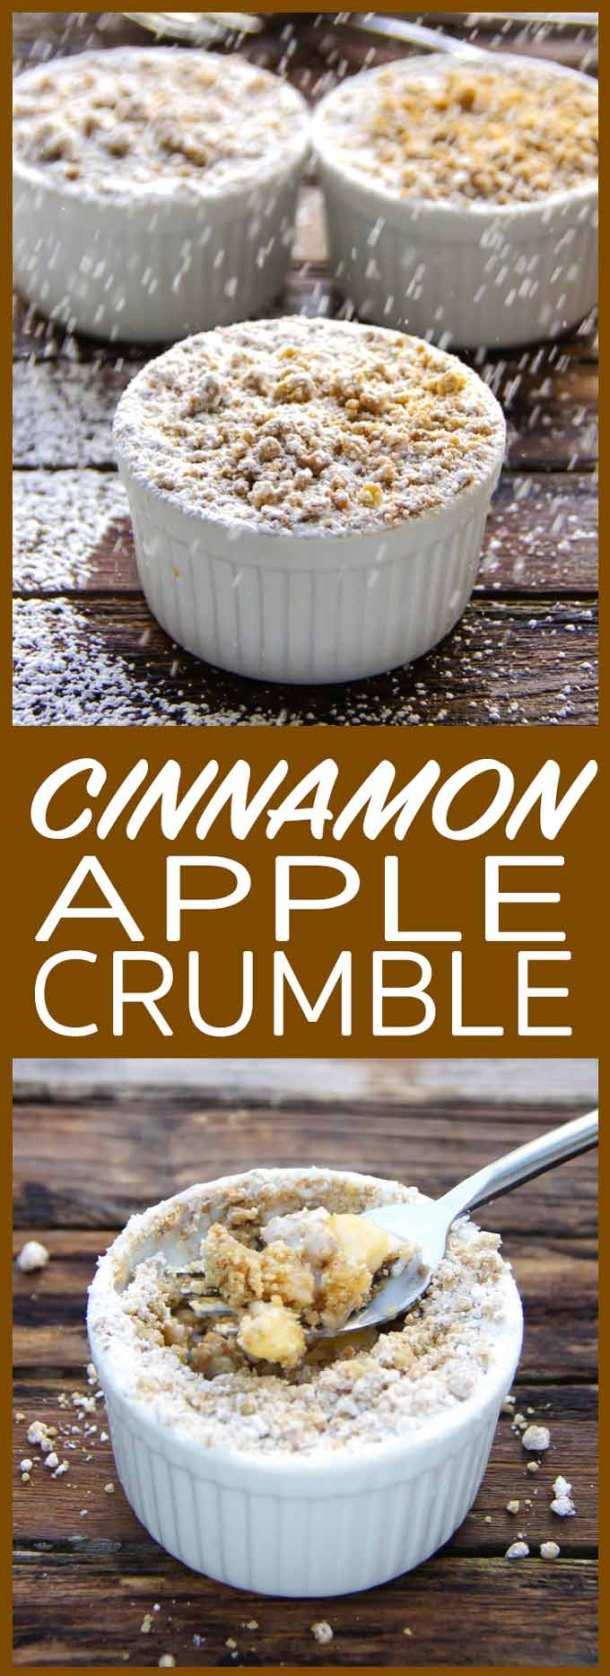 Cinnamon Apple Crumble Recipe {Gluten Free!} | Garlic Matters - Apple Recipes